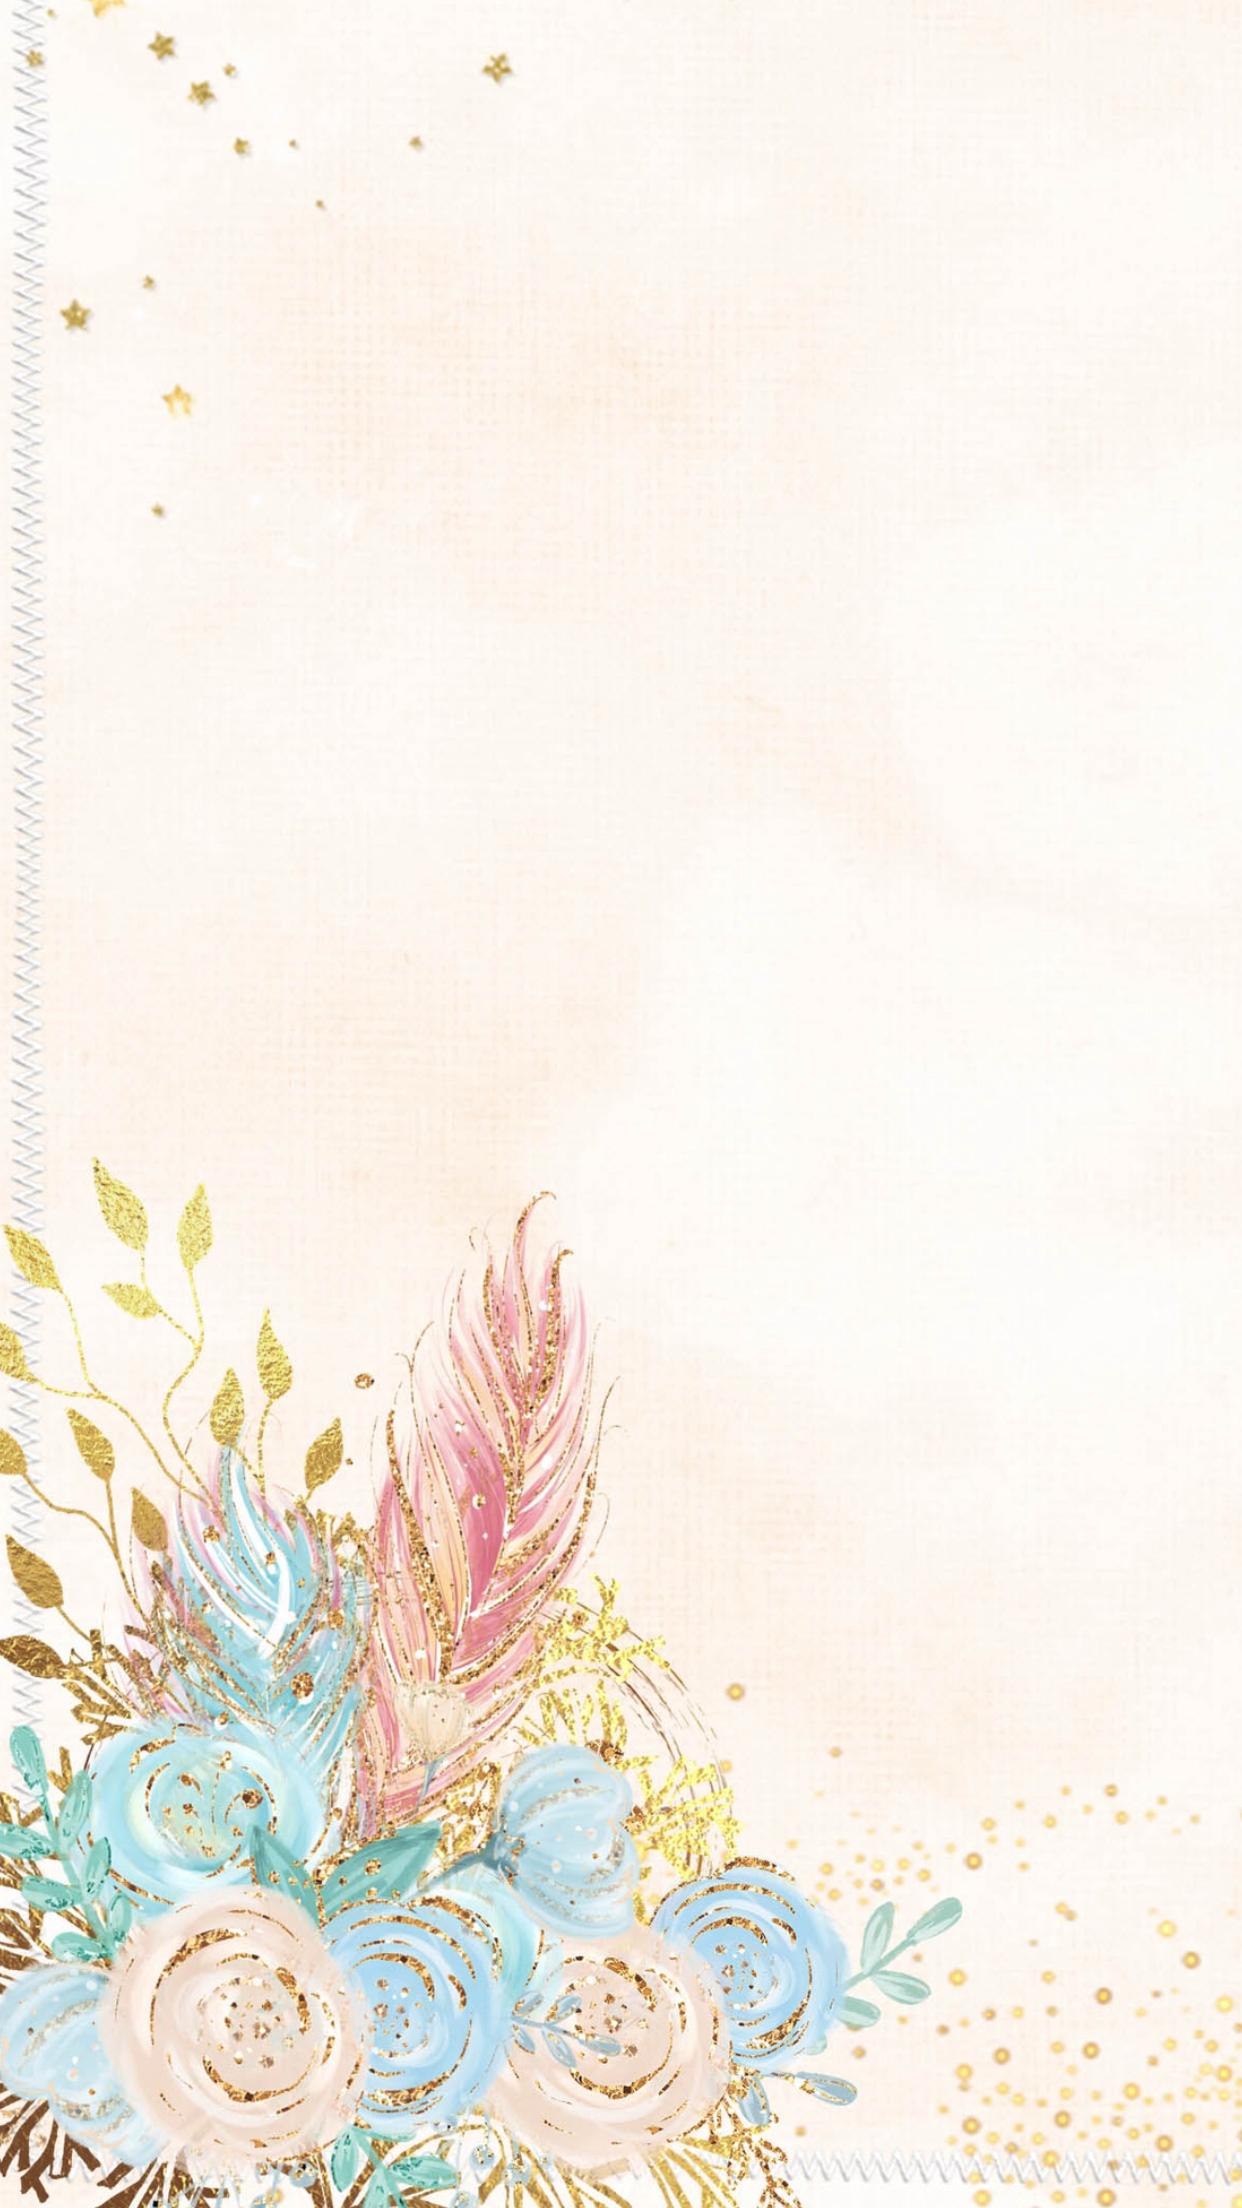 Wallpaper Iphone Mermaid Wallpapers Flower Background Wallpaper Cute Wallpapers